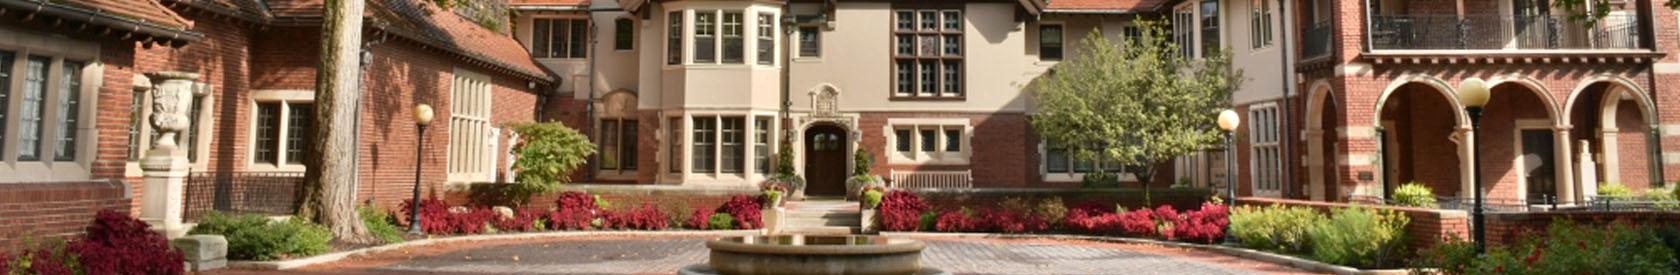 Hearth & Soul:  Cranbrook House & Gardens